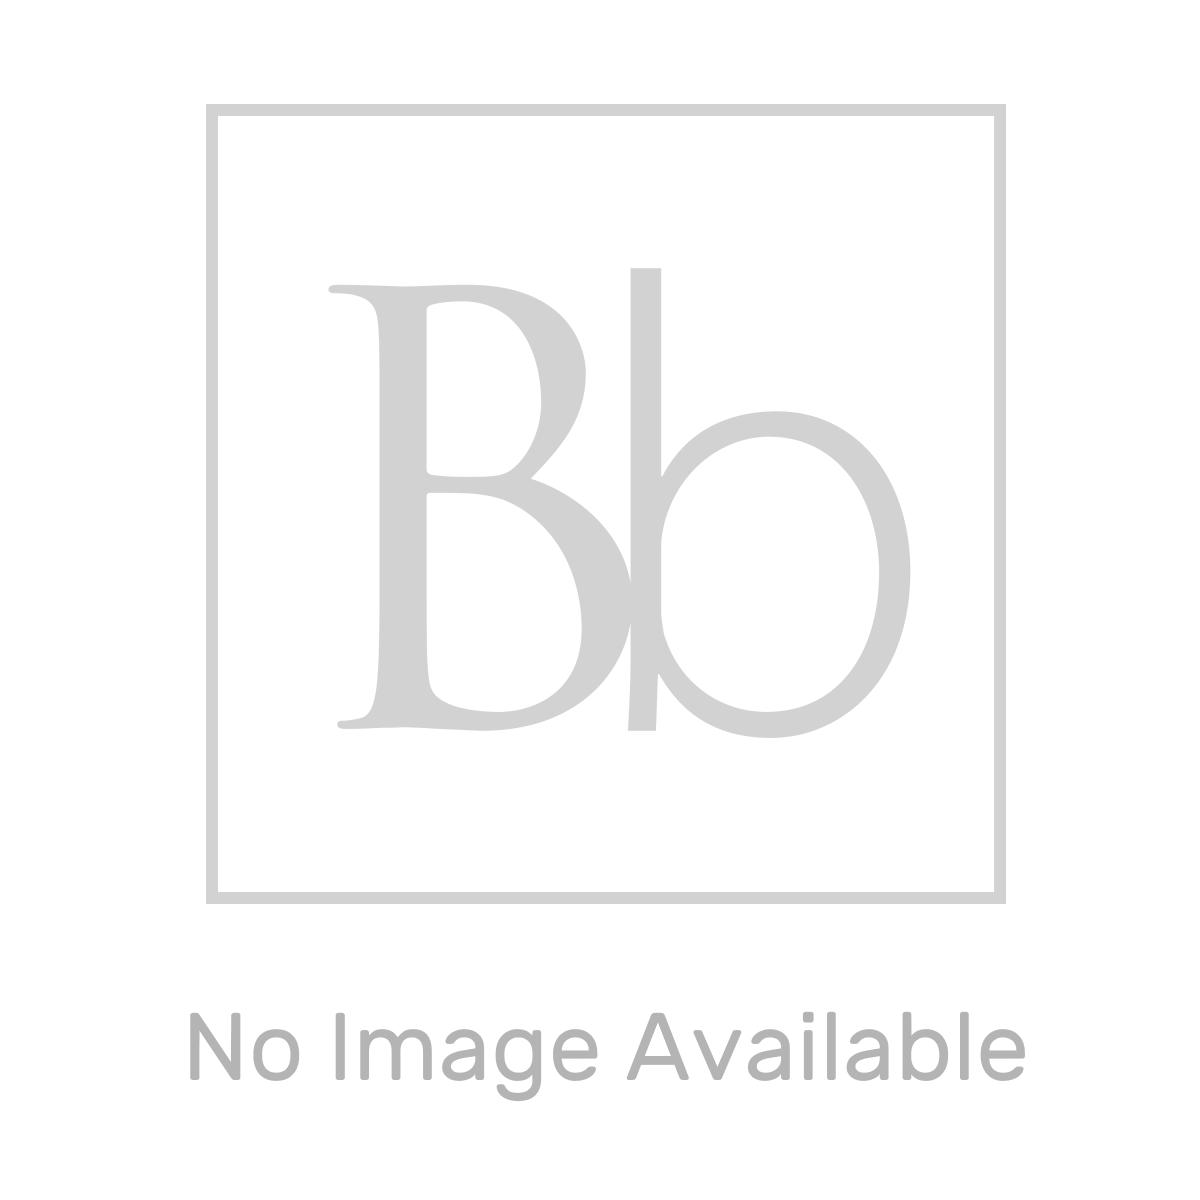 Aquadart White Slate Shower Tray 1500 x 900 Overhead